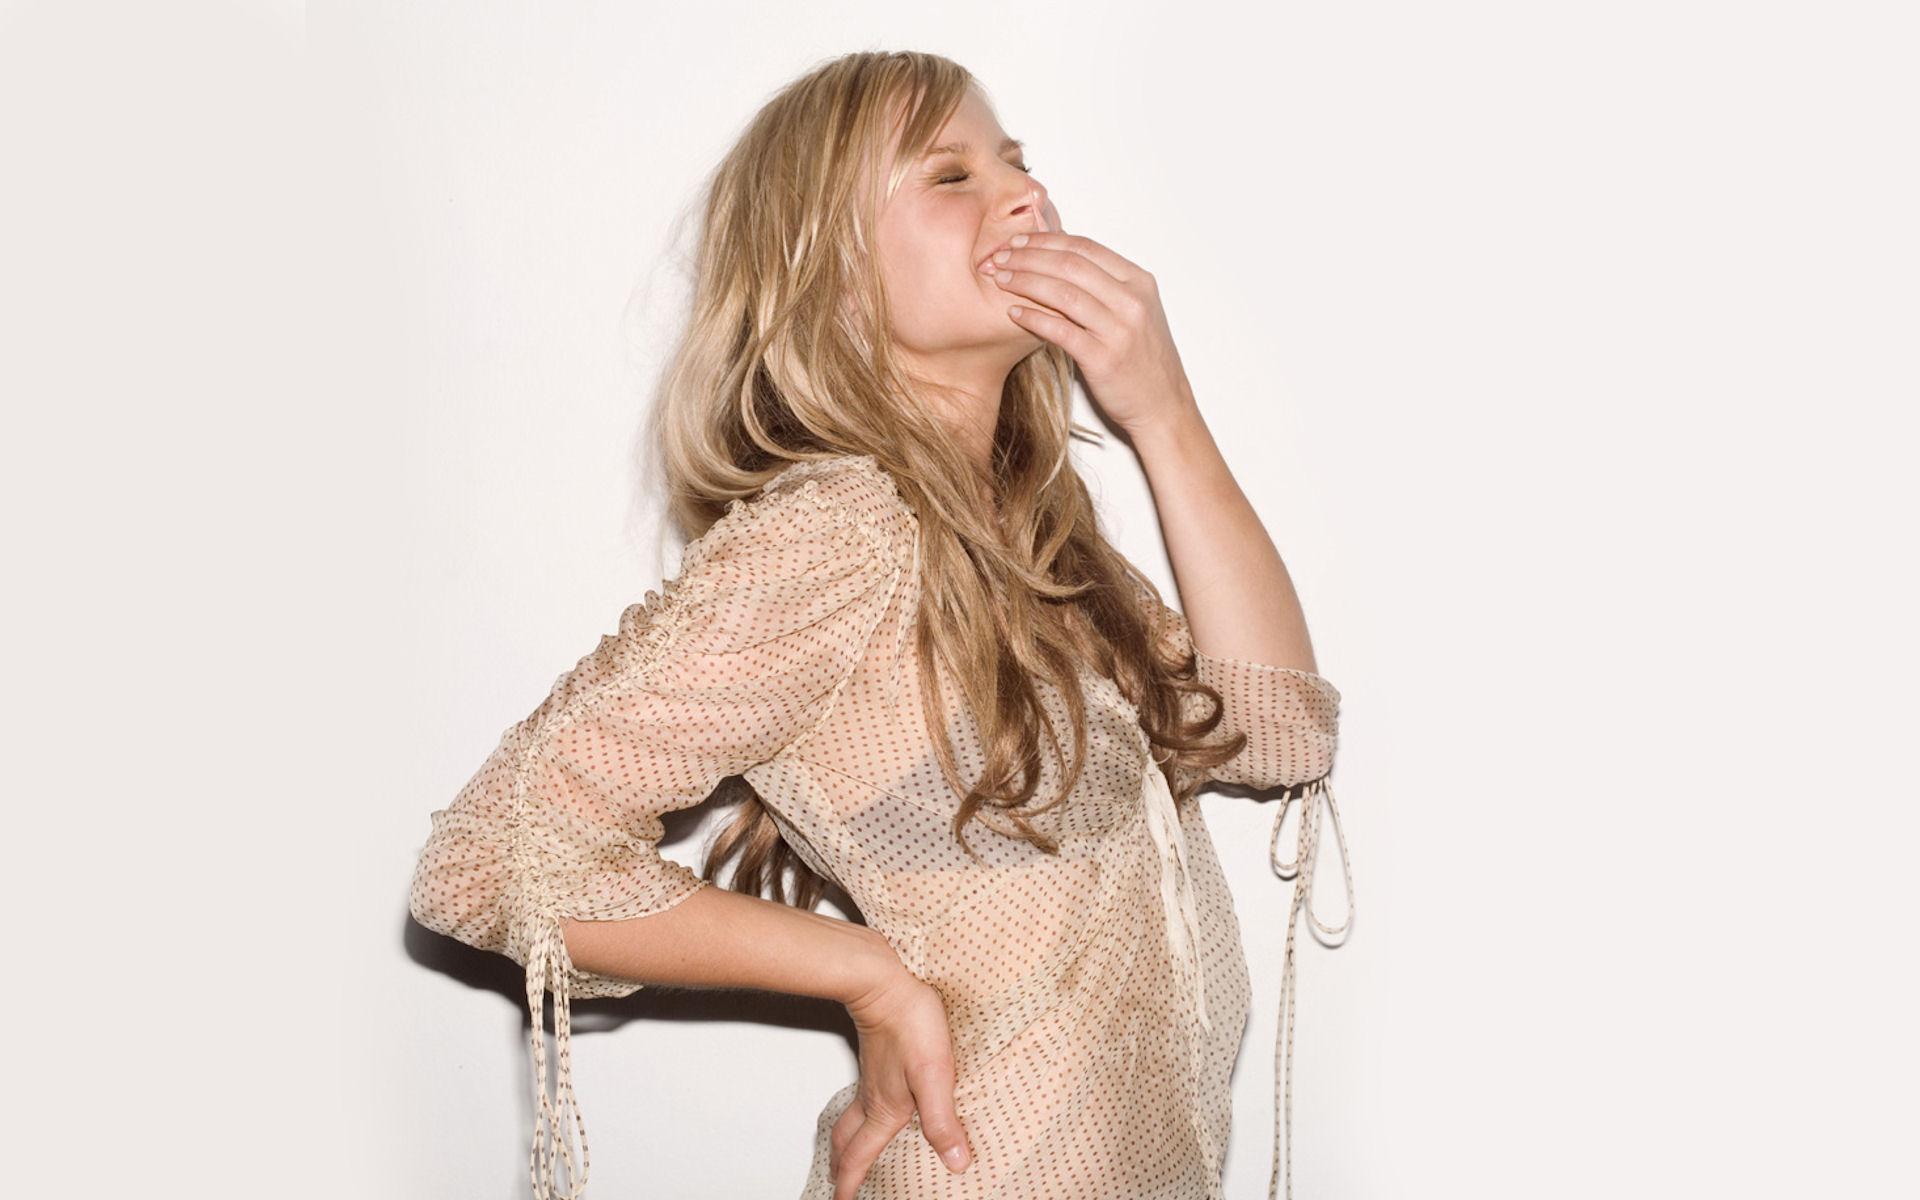 Kristen Bell riéndose - 1920x1200